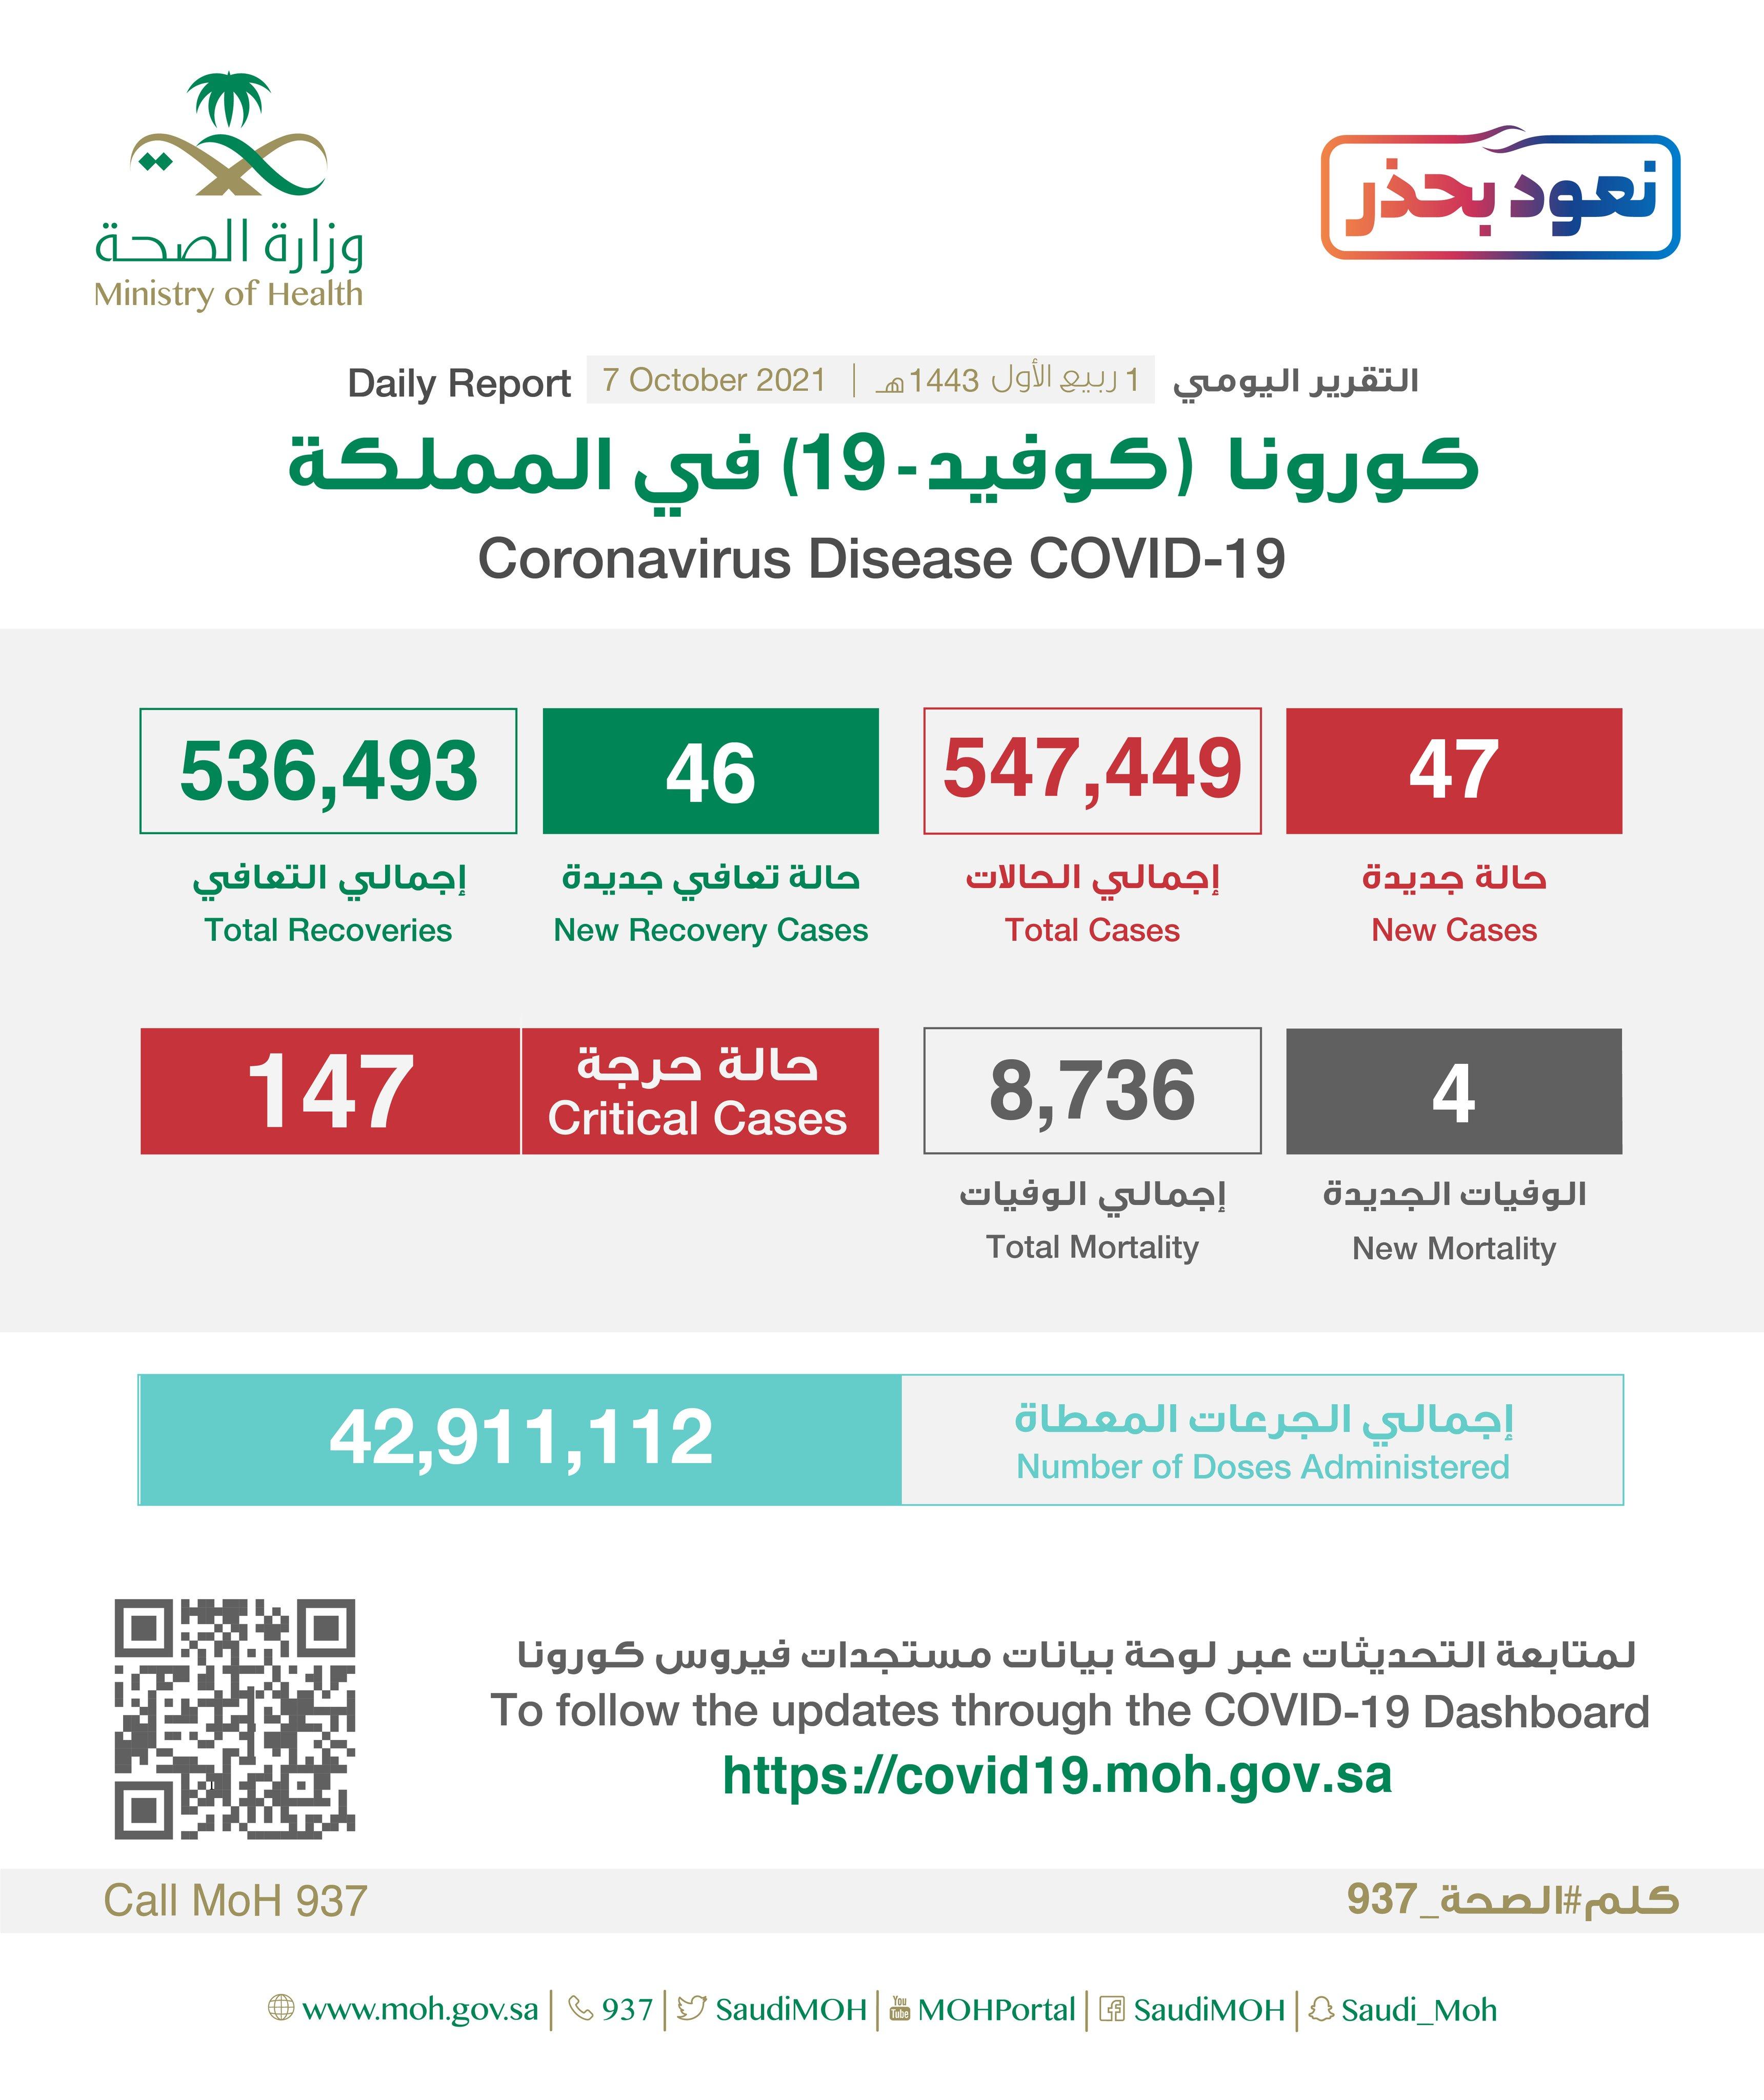 Saudi Arabia Coronavirus : Total Cases : 547,449, New Cases : 47, Cured : 536,493 , Deaths: 8,736, Active Cases : 2,220